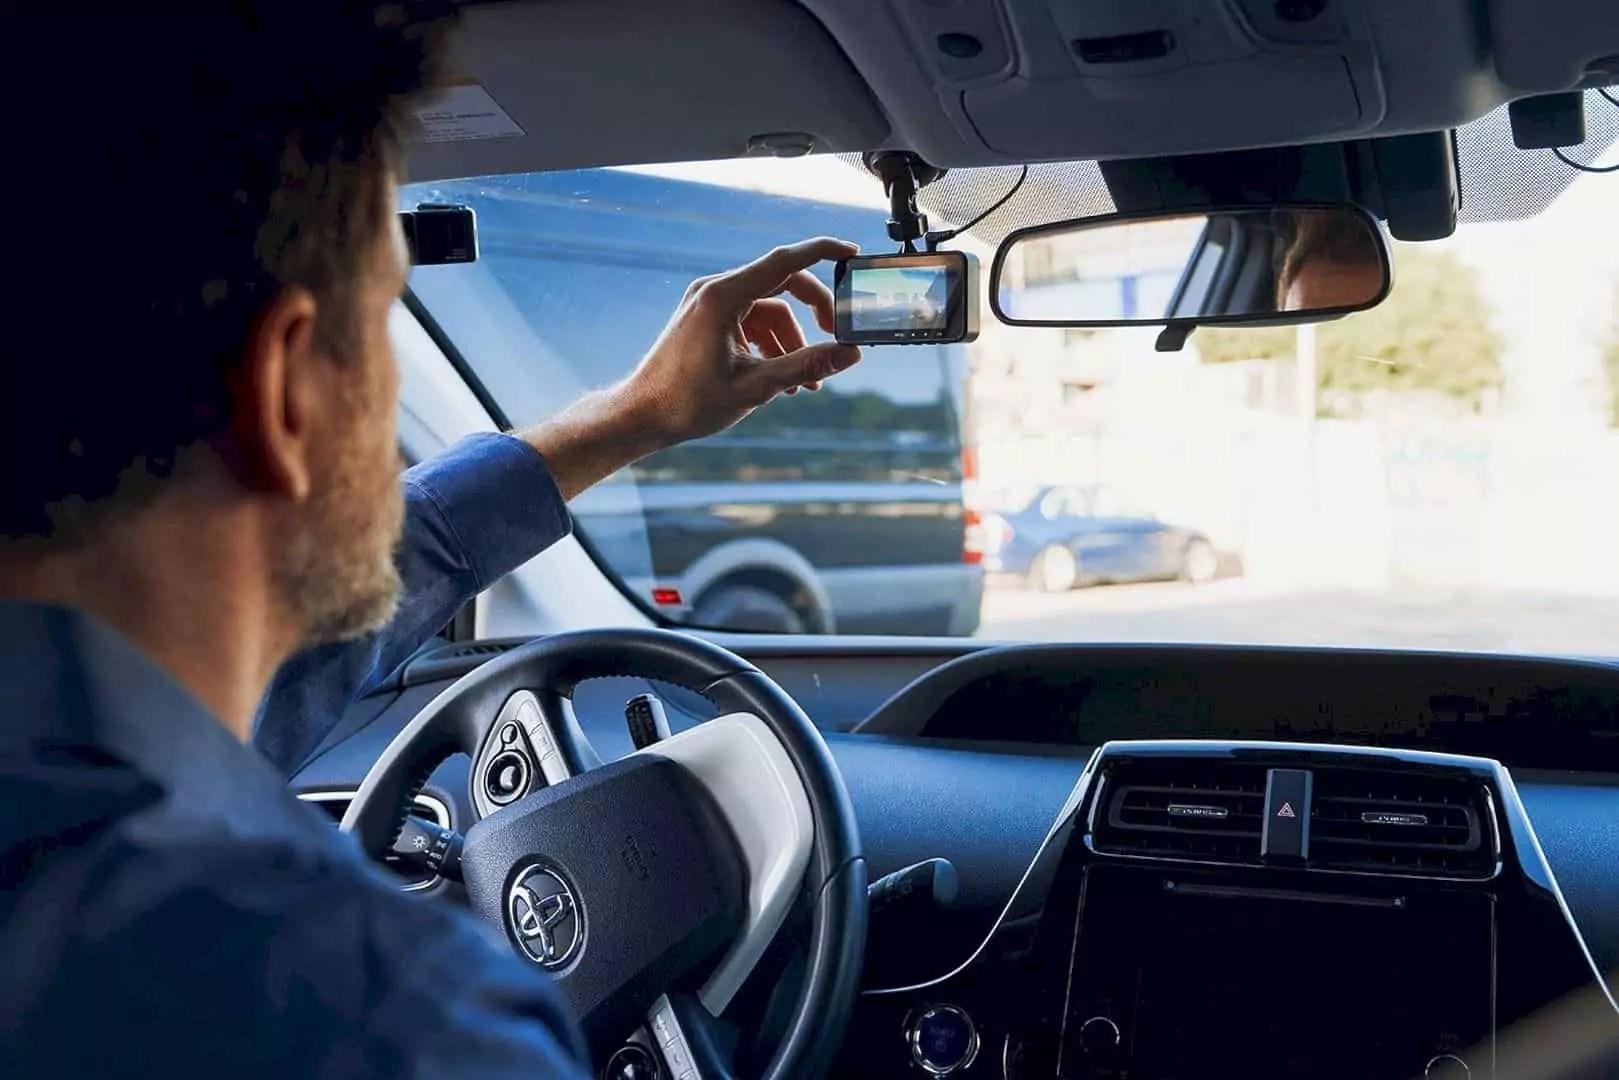 Drivesafe The Multi Dash Cam System 8